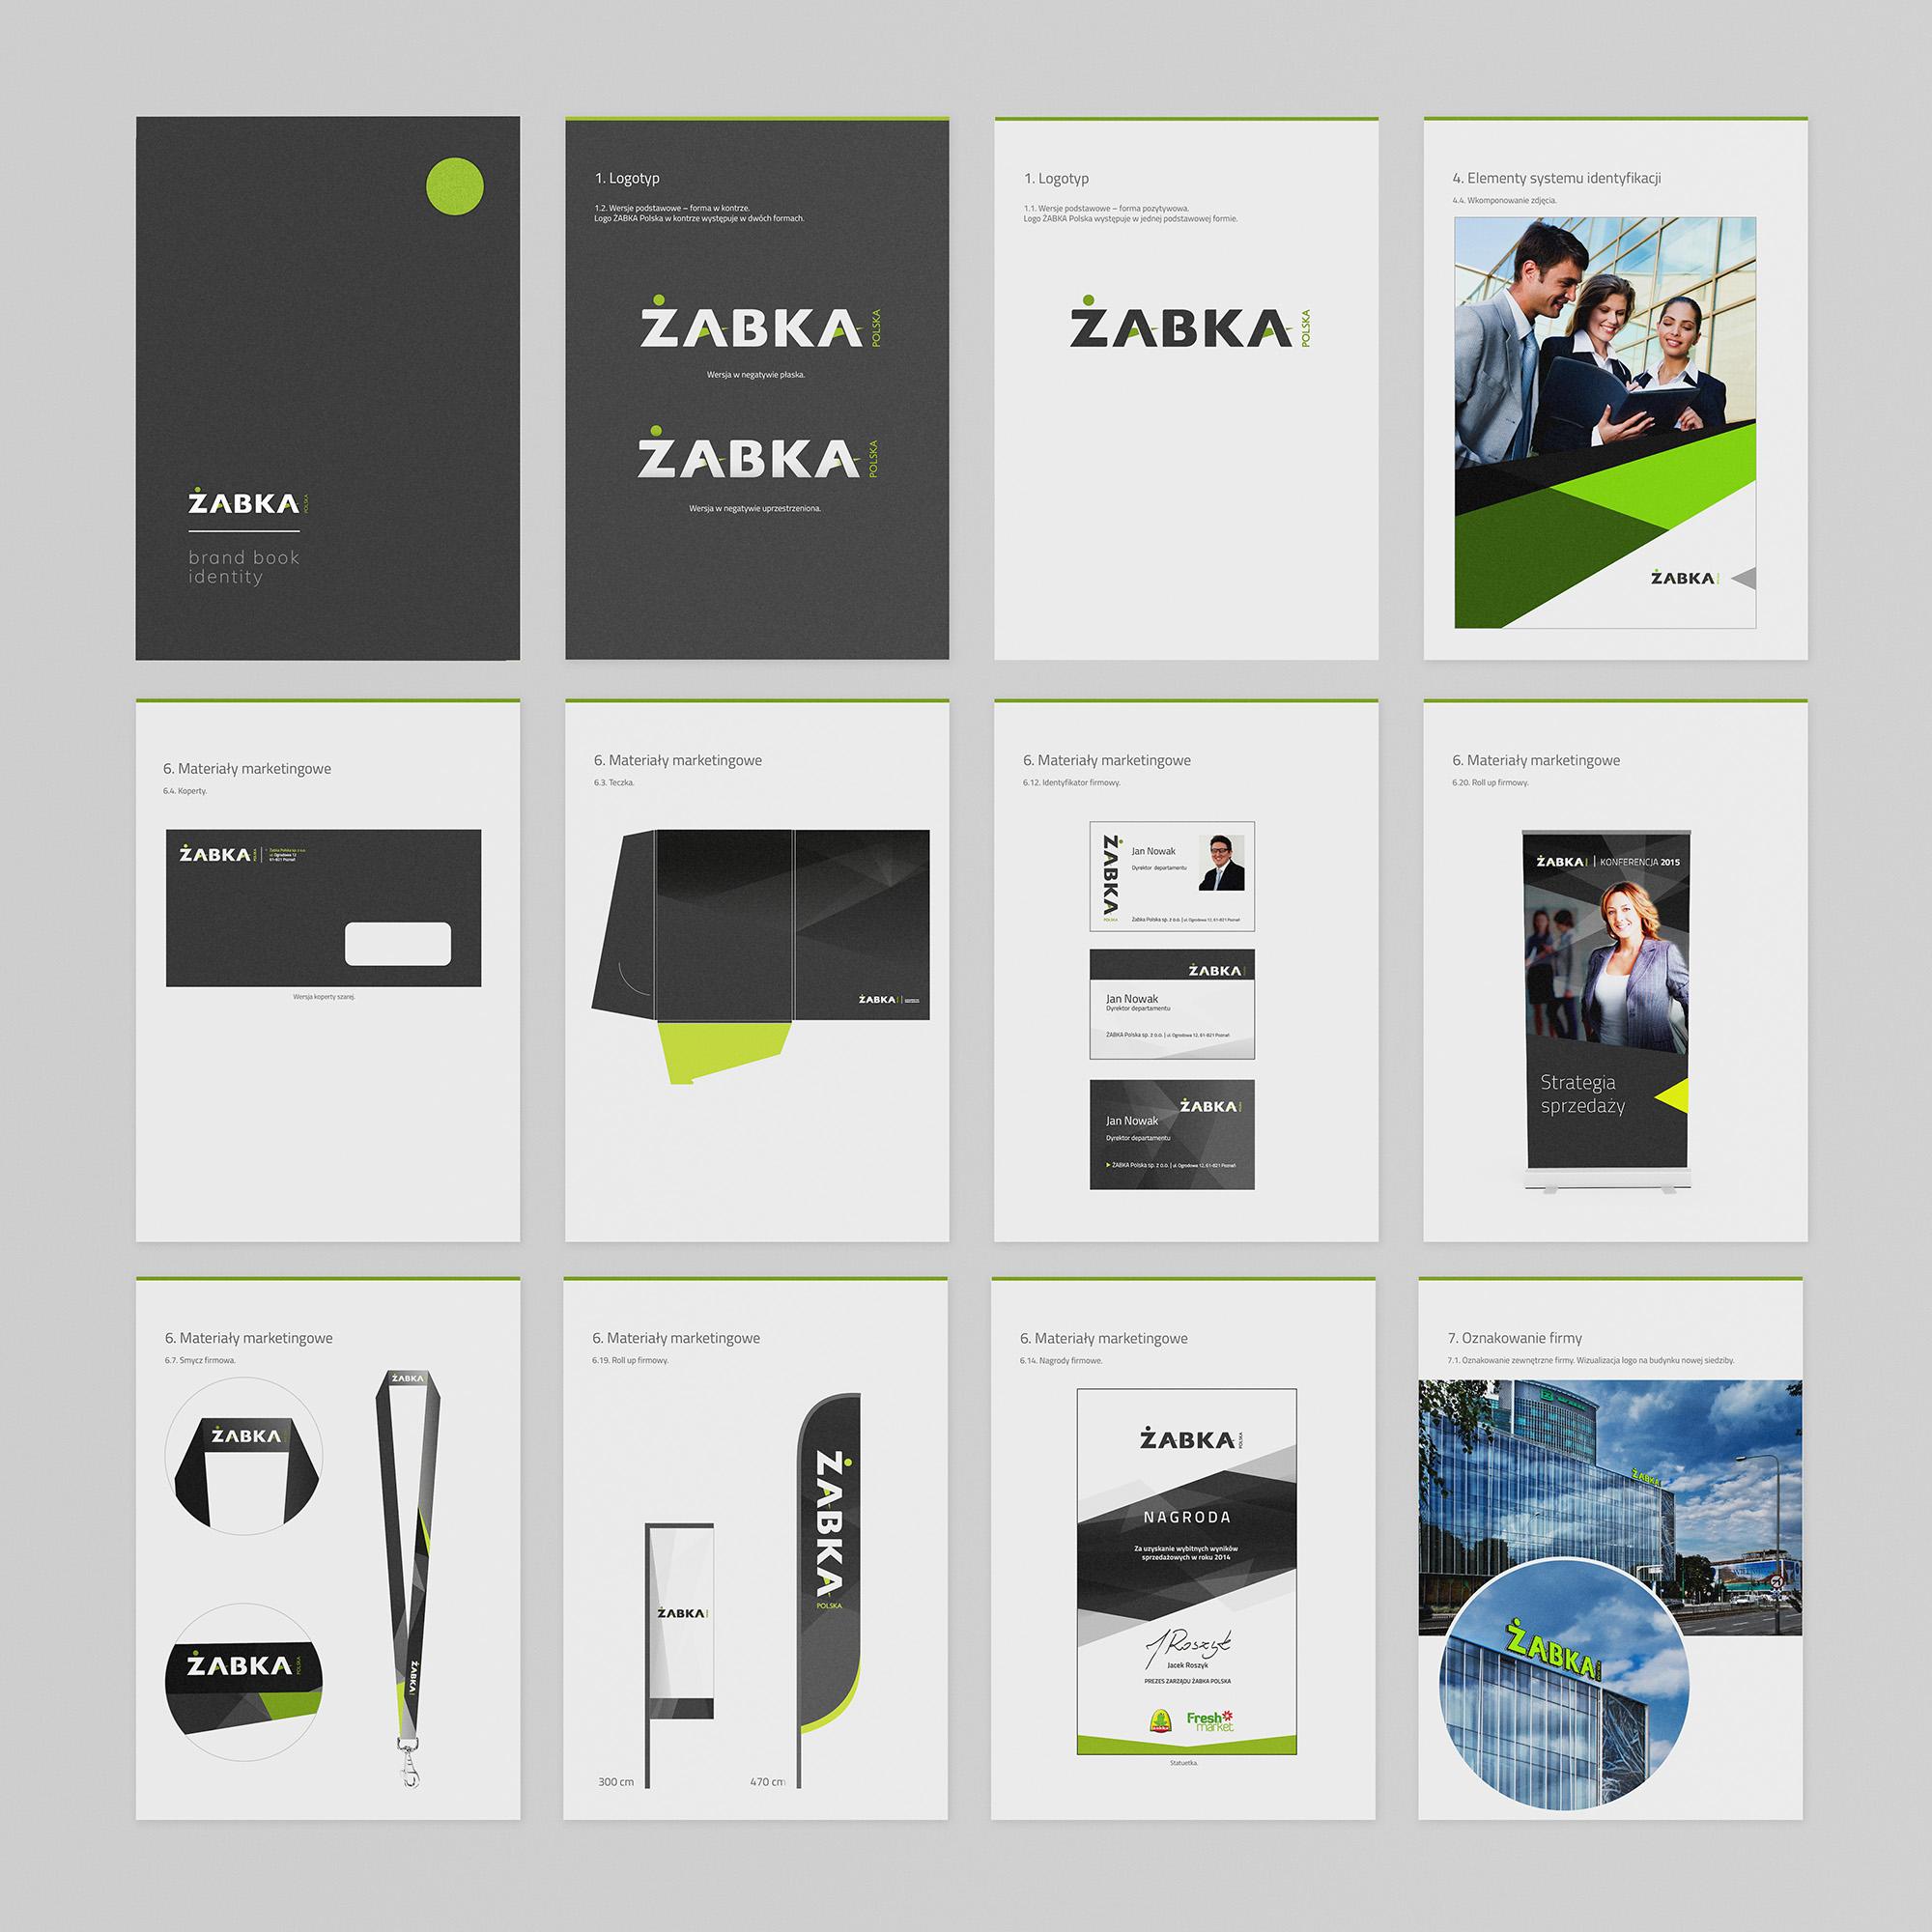 logo design, identyfikacja marki, branding, brand book, znak graficzny, logo firmy, ci, art designer - Ireneusz Bloch